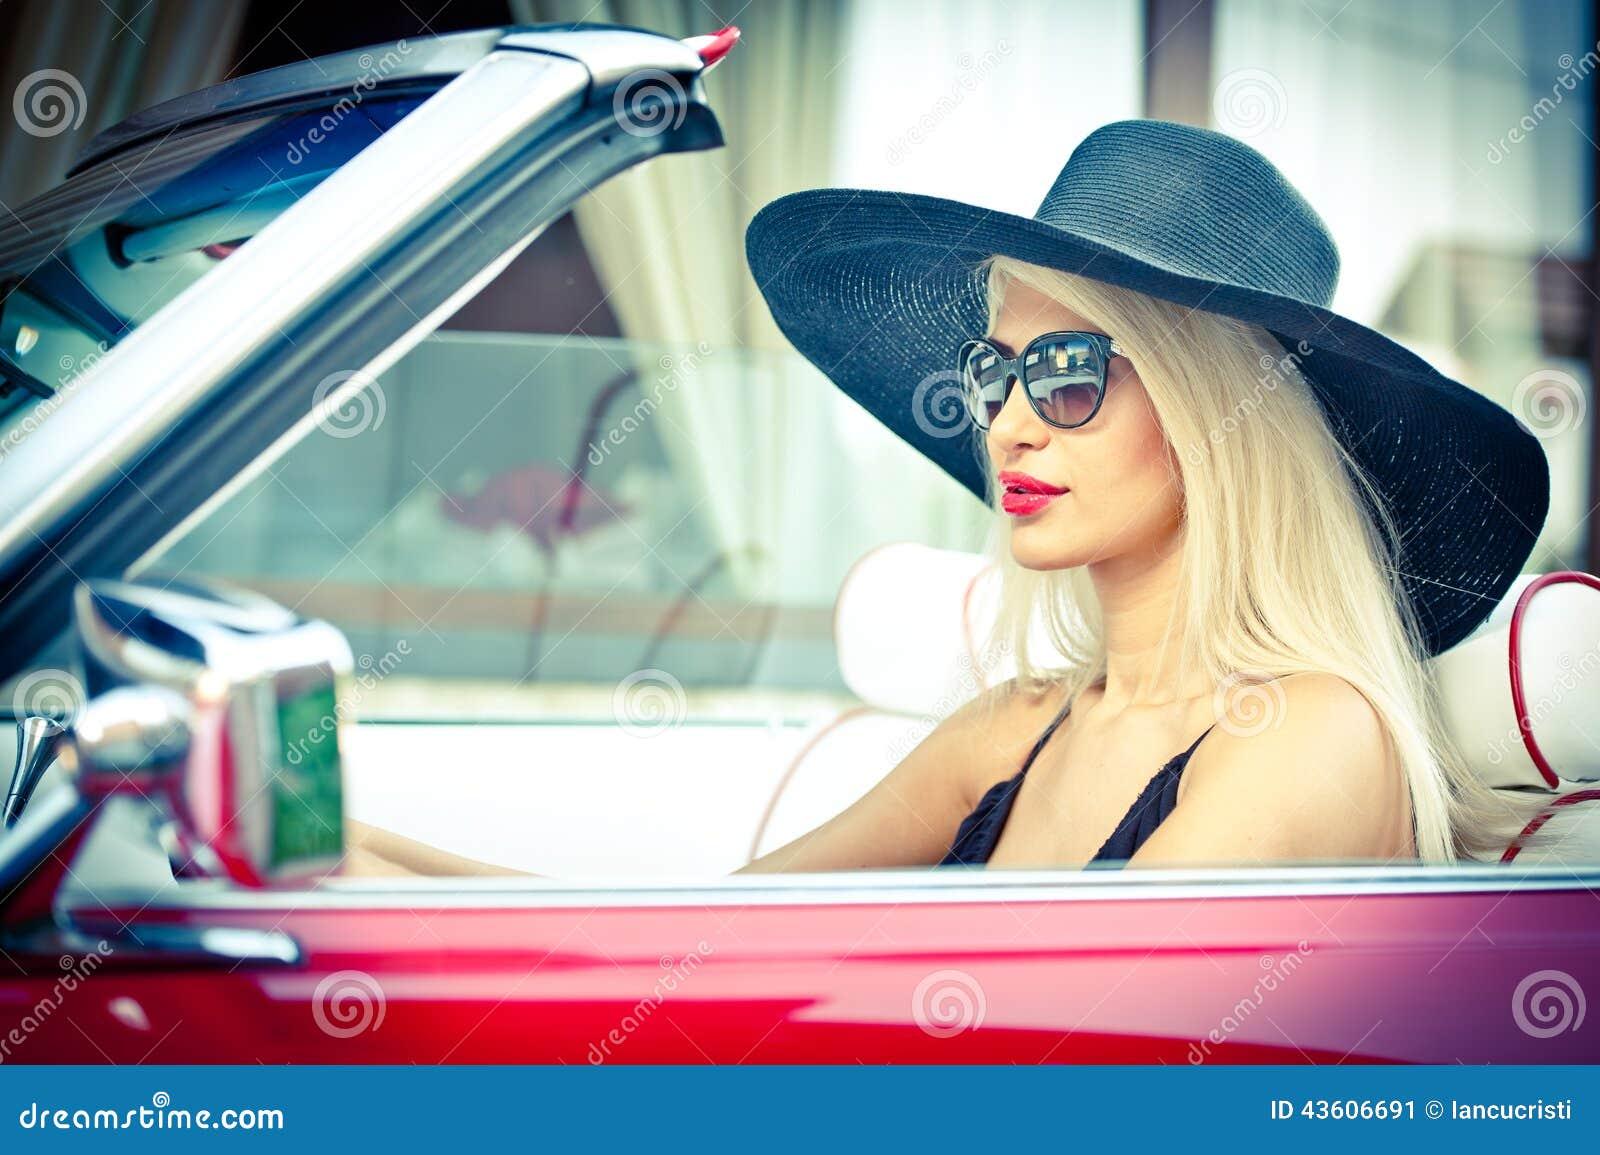 Video naked girl driving convertible cars